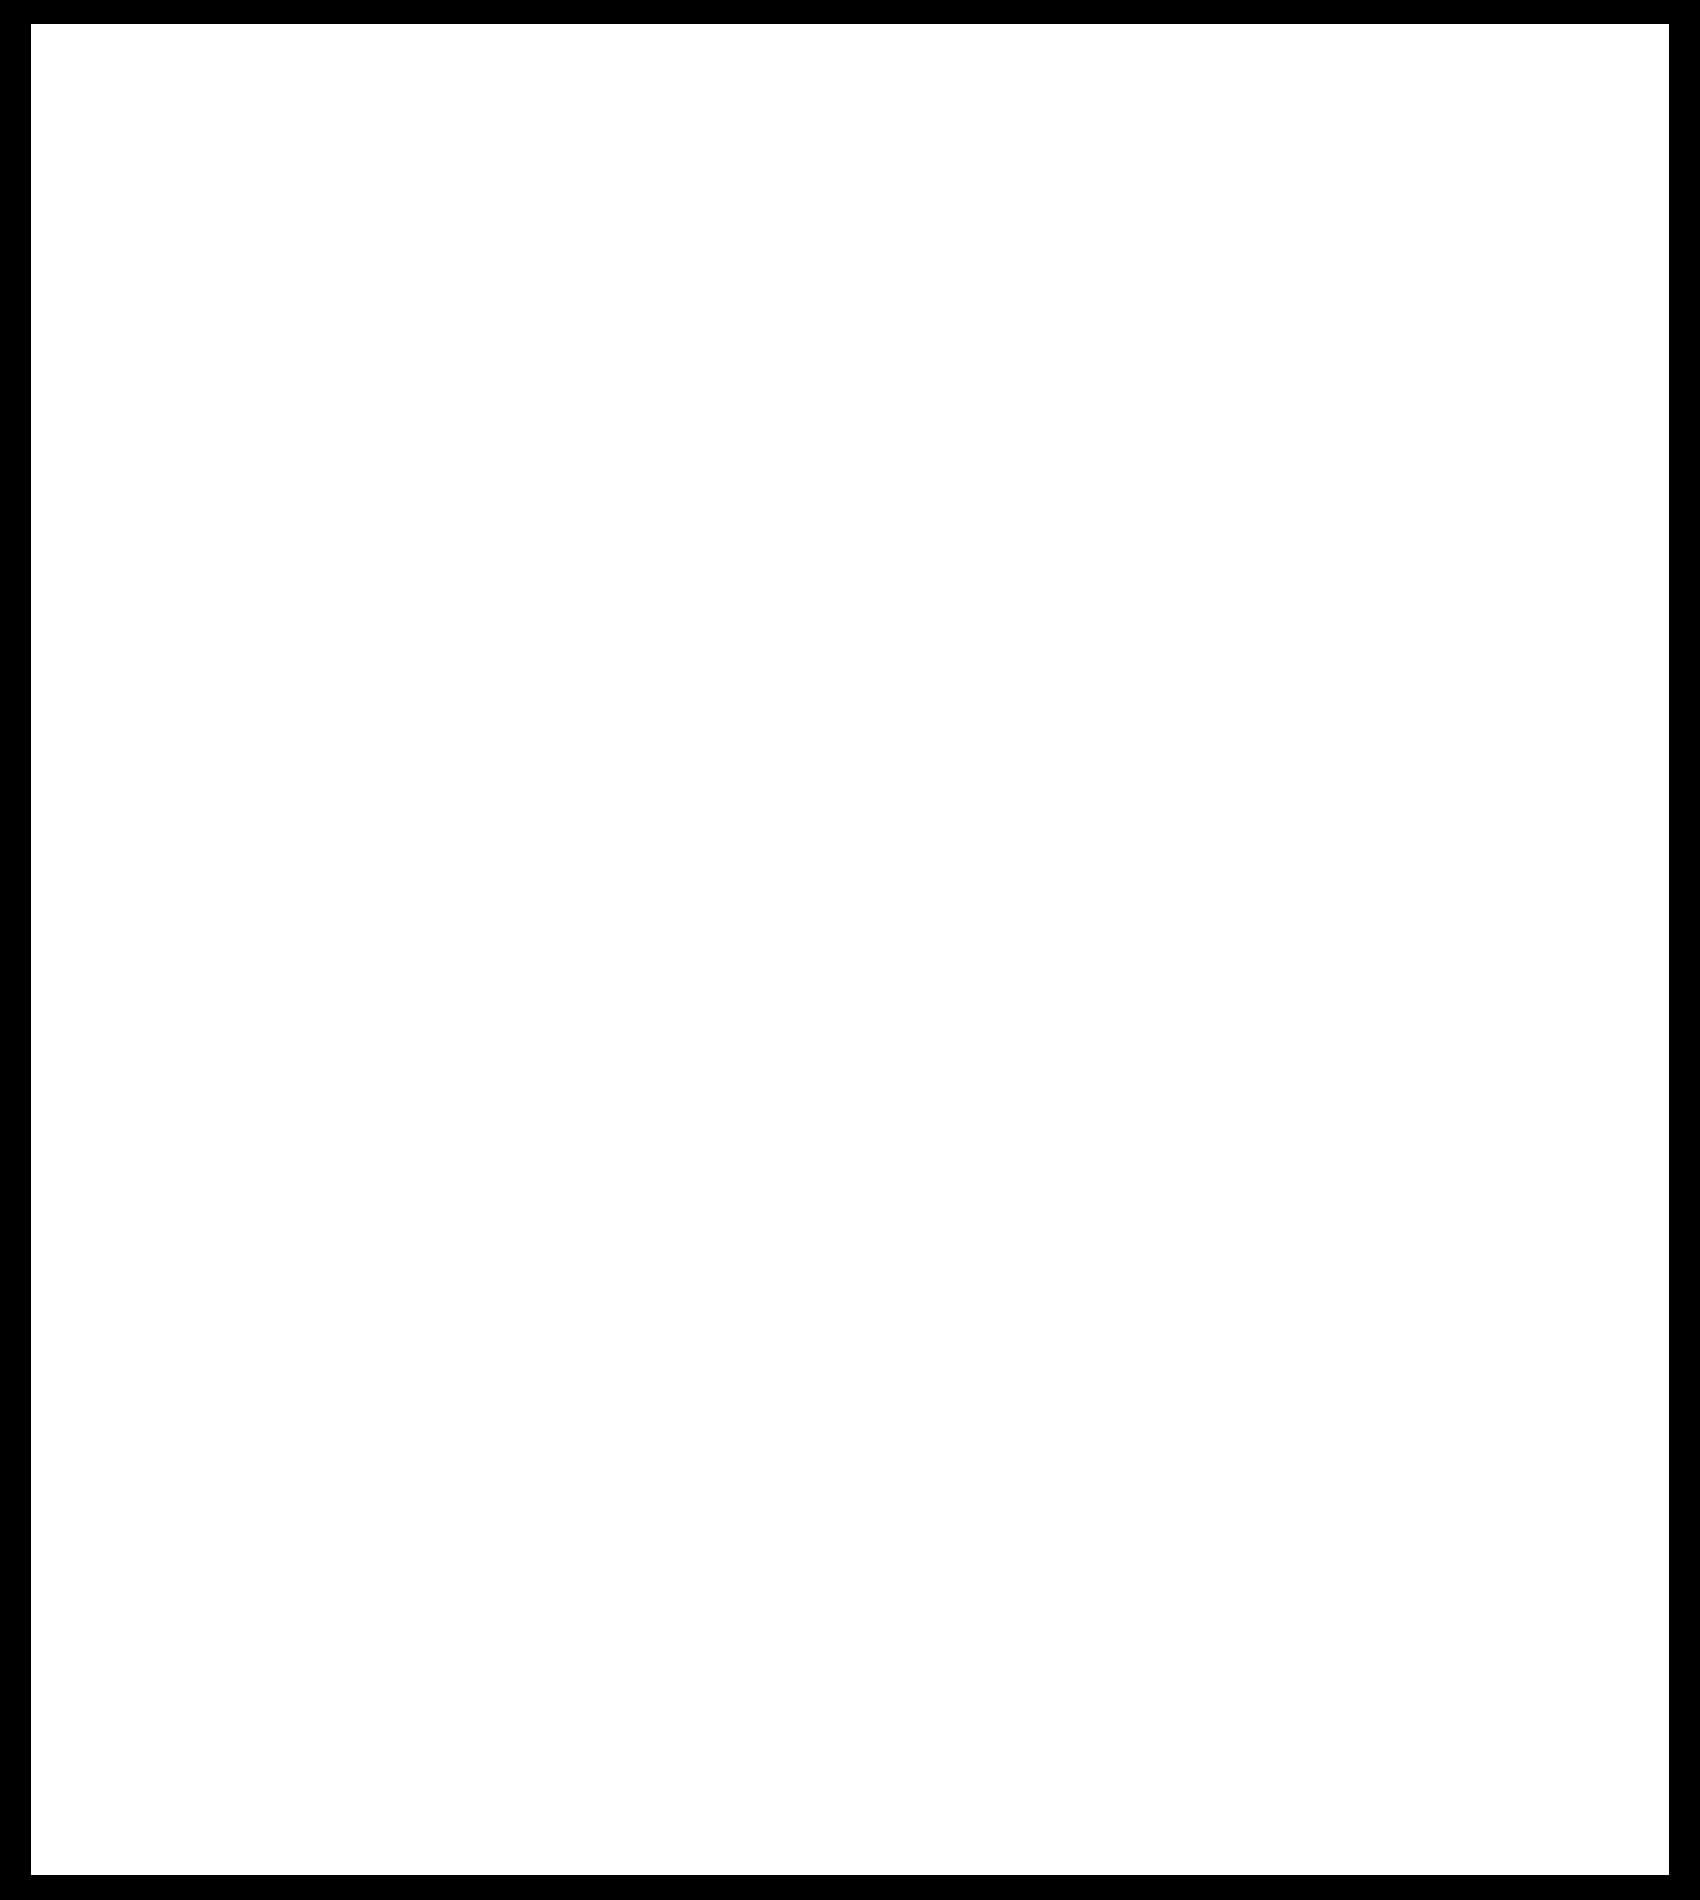 Free white cliparts download. Square clipart black outline